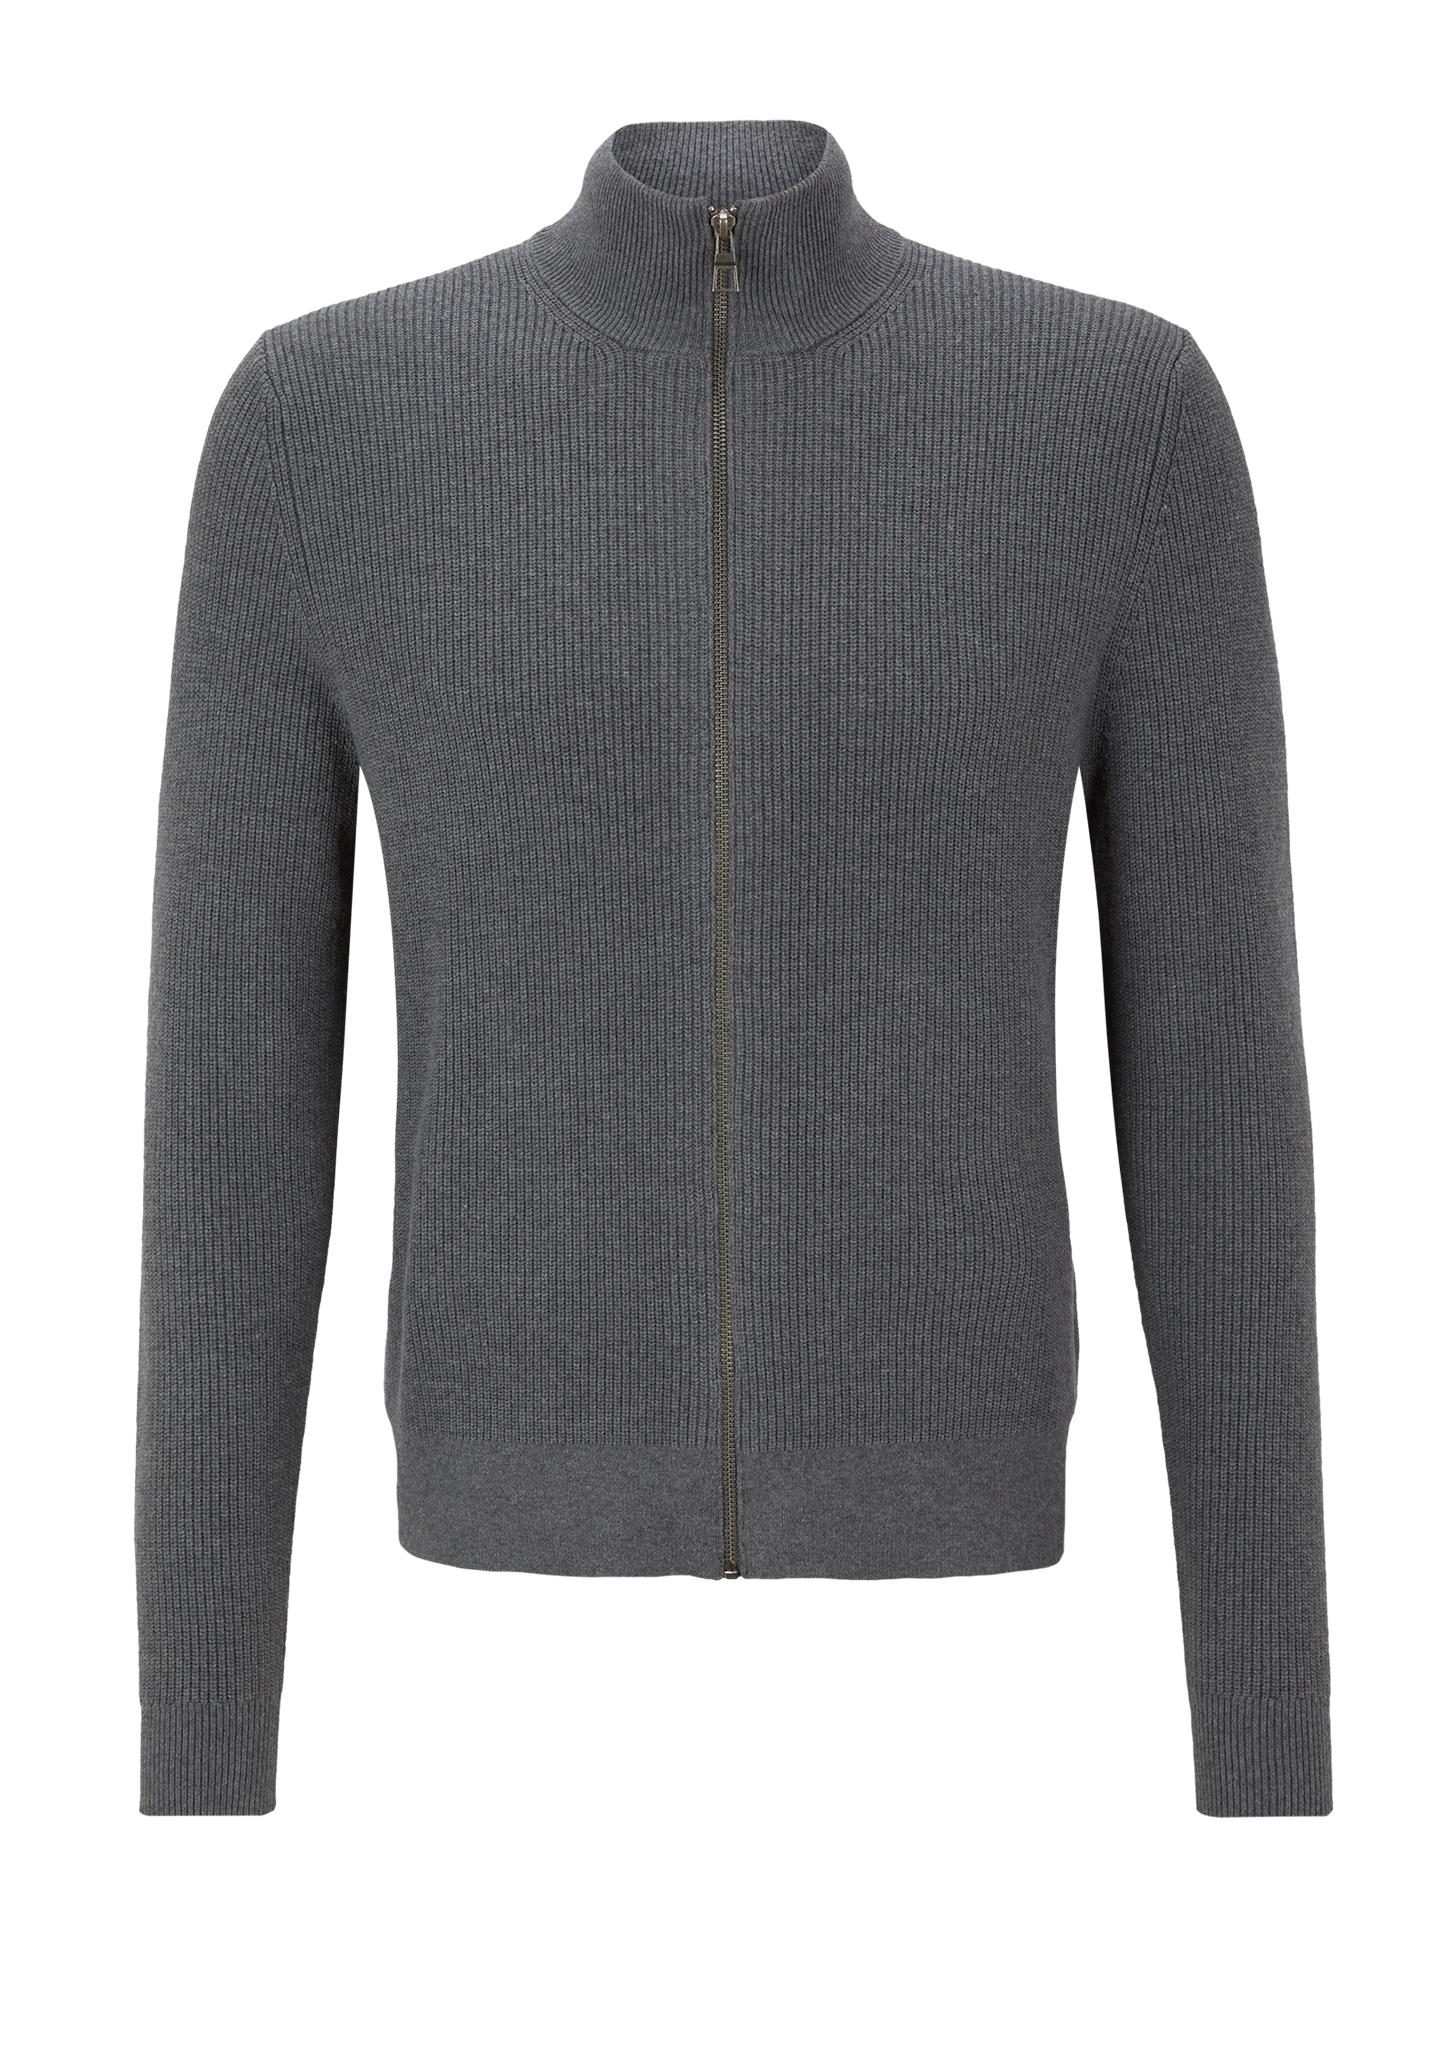 Strickjacke   Bekleidung > Strickjacken & Cardigans > Strickjacken   Grau   80% baumwolle -  20% modal   s.Oliver BLACK LABEL